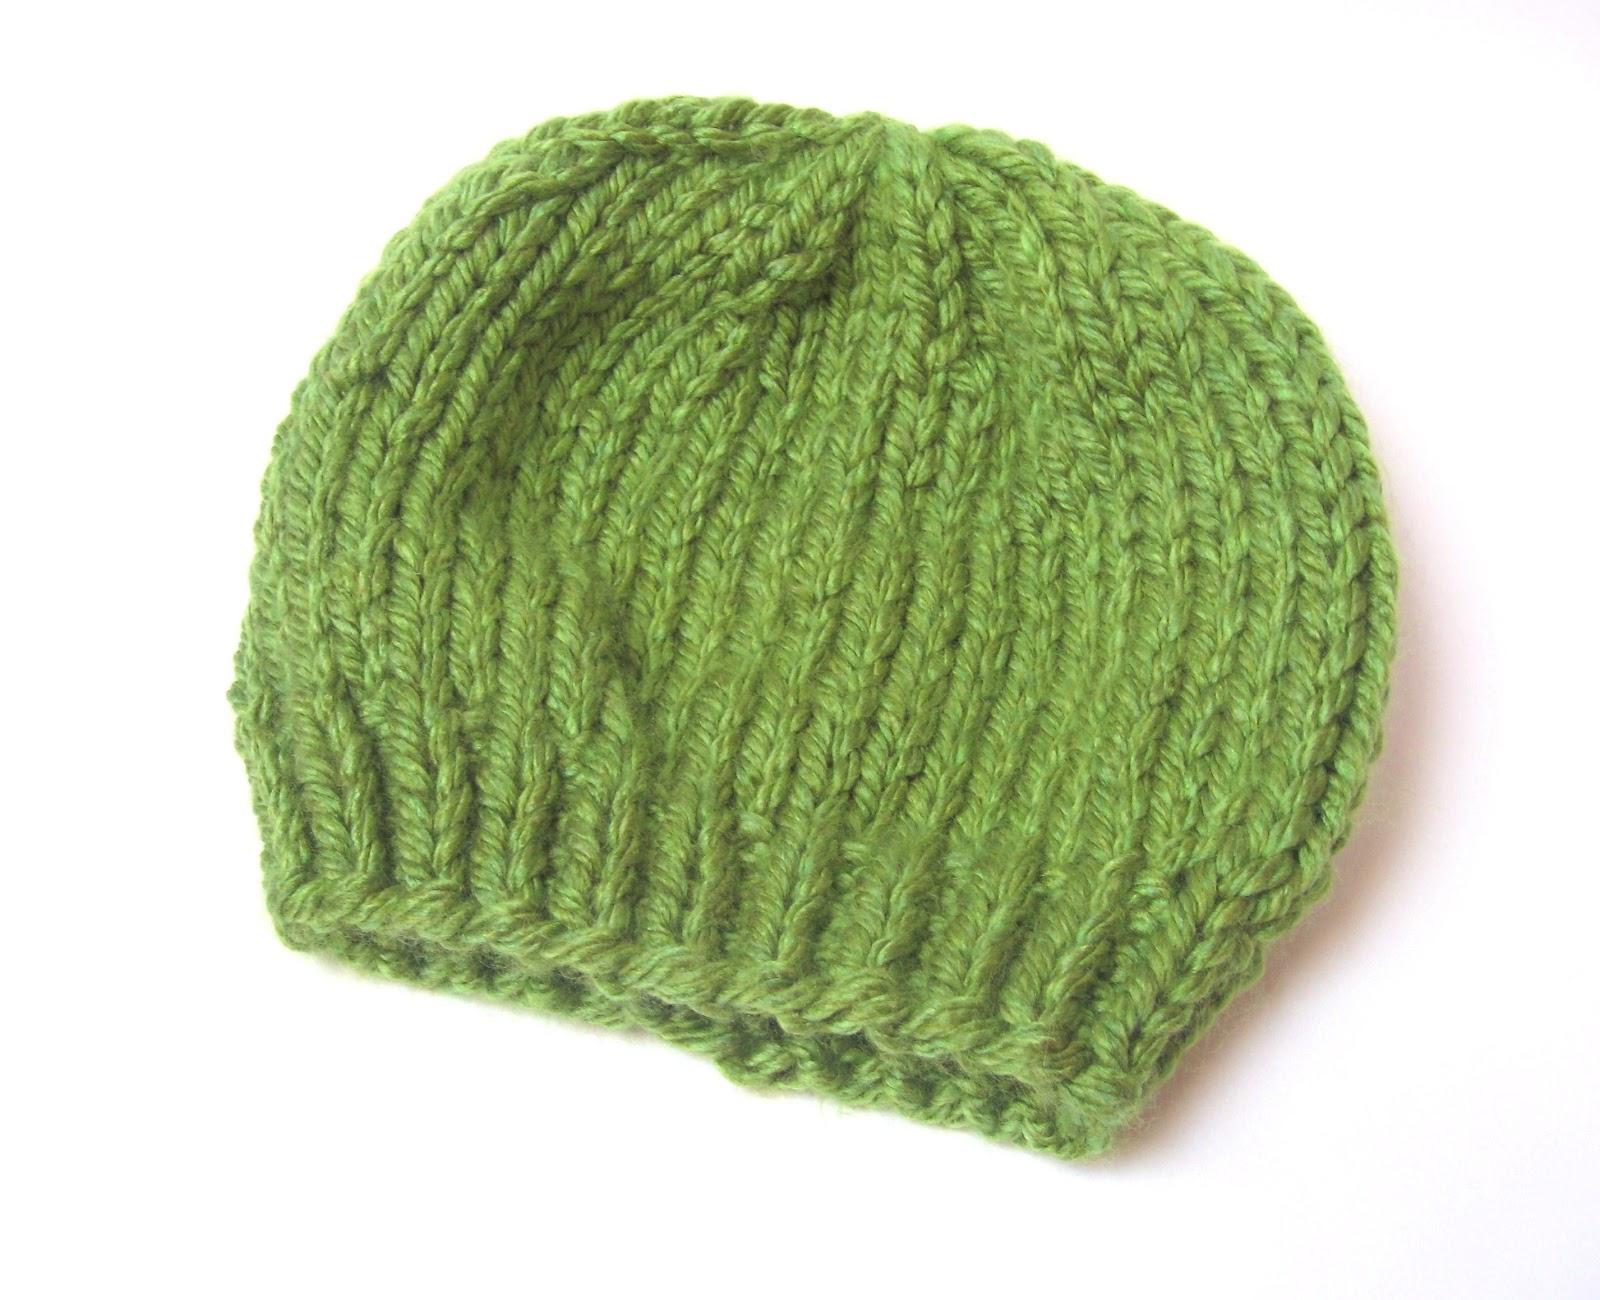 megan E sass handknits  Free Knitting Pattern  Easy Chunky Knit ... 47cf2fd9059